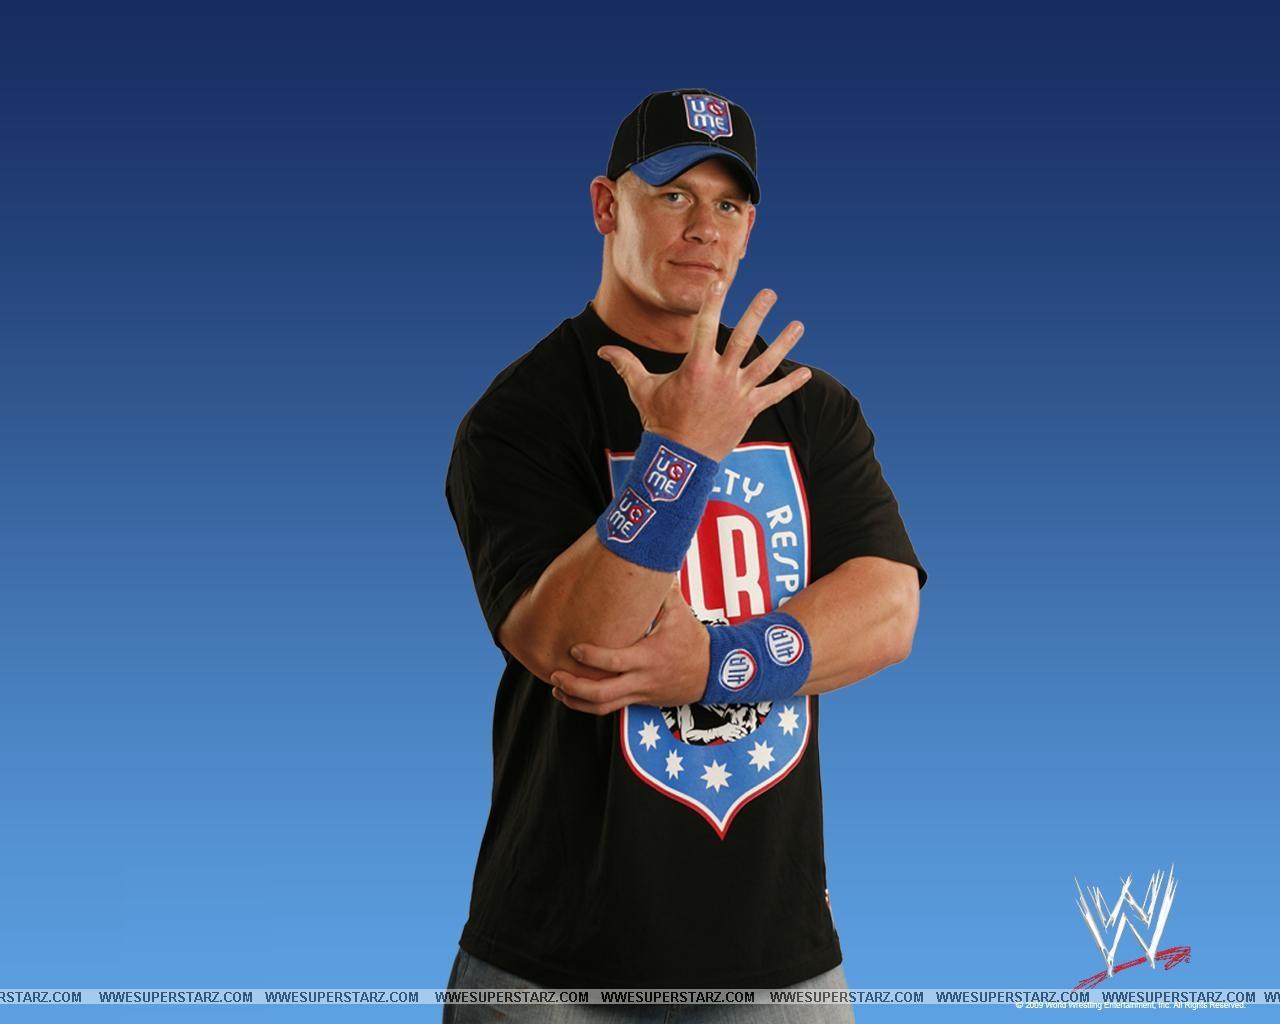 John Cena Wallpaper | 3D Wallpaper | Nature Wallpaper ...